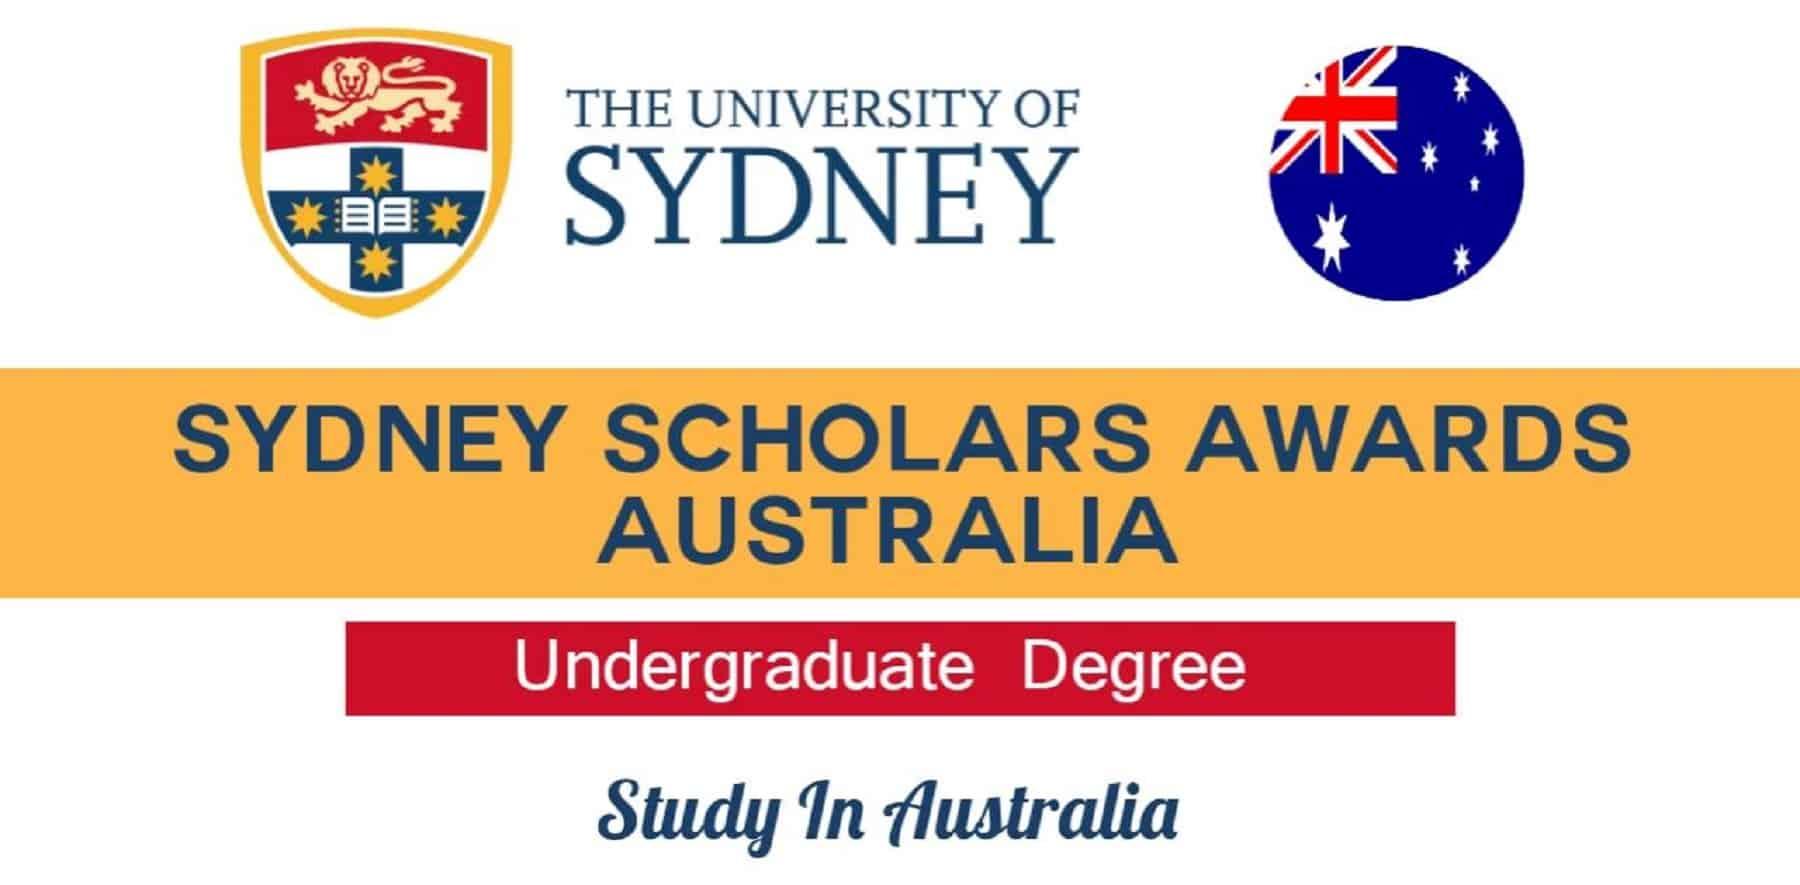 Sydney Scholars Awards